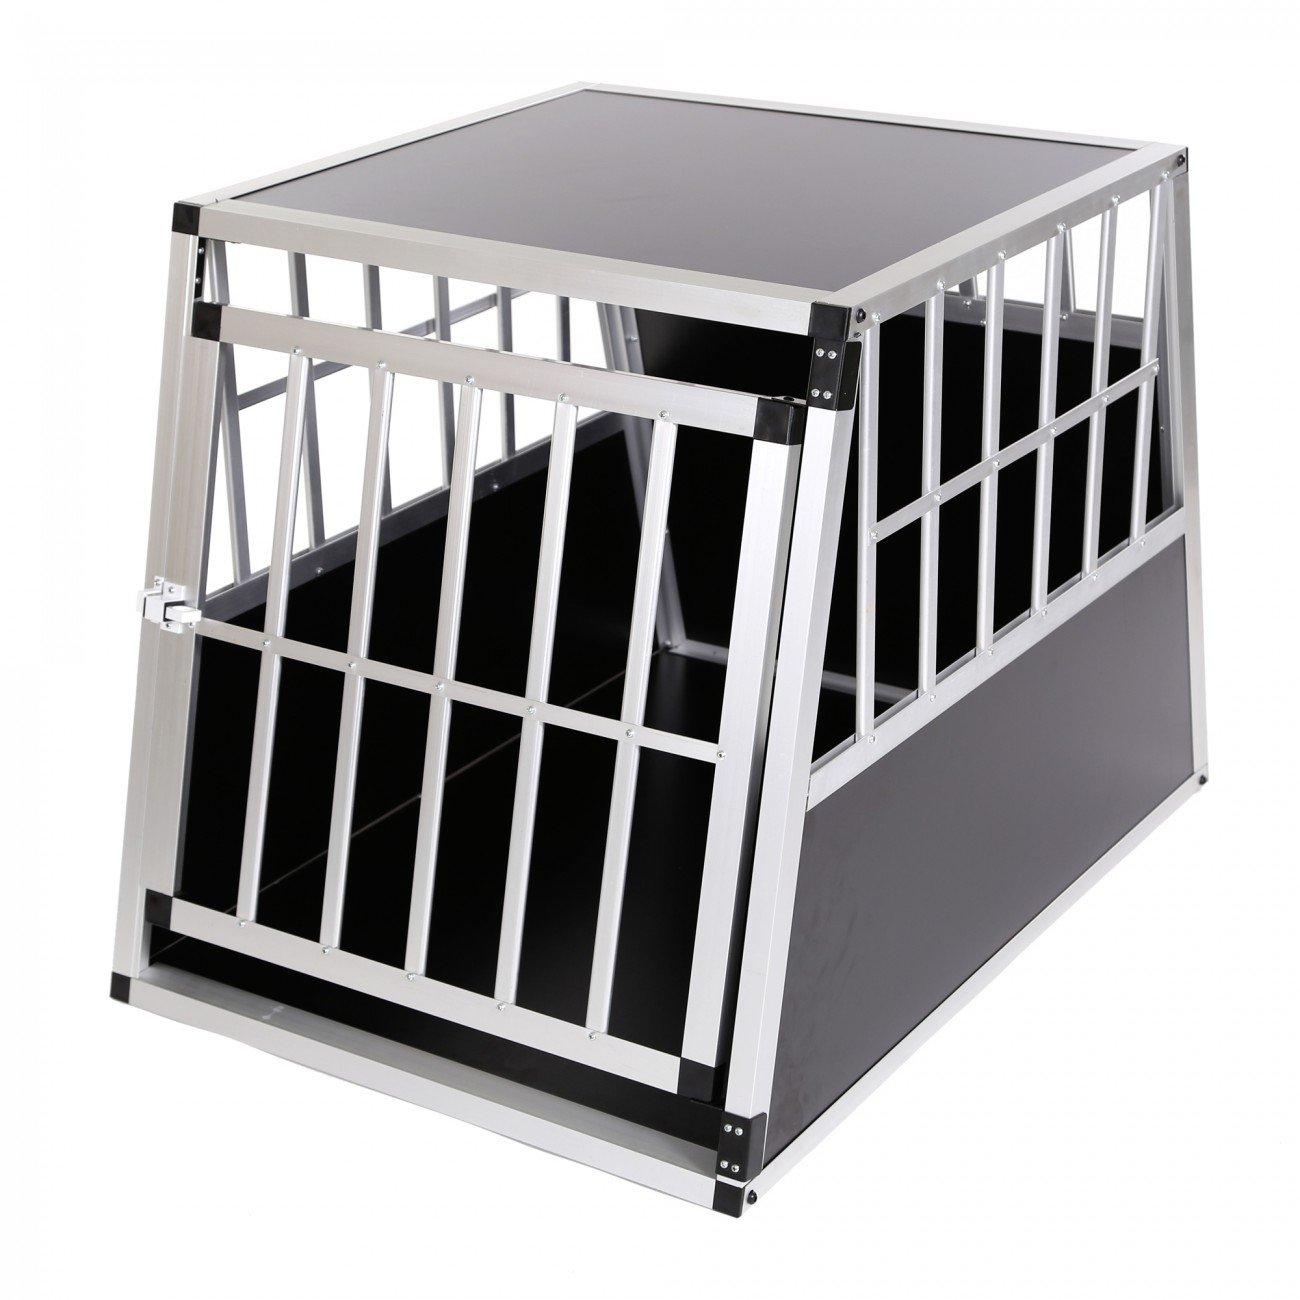 zoomundo Alu Transportbox Hundebox Reisebox Hundetransportbox 1-Türig Autotransportbox Kofferraumbox Gitterbox Käfig Box Premium